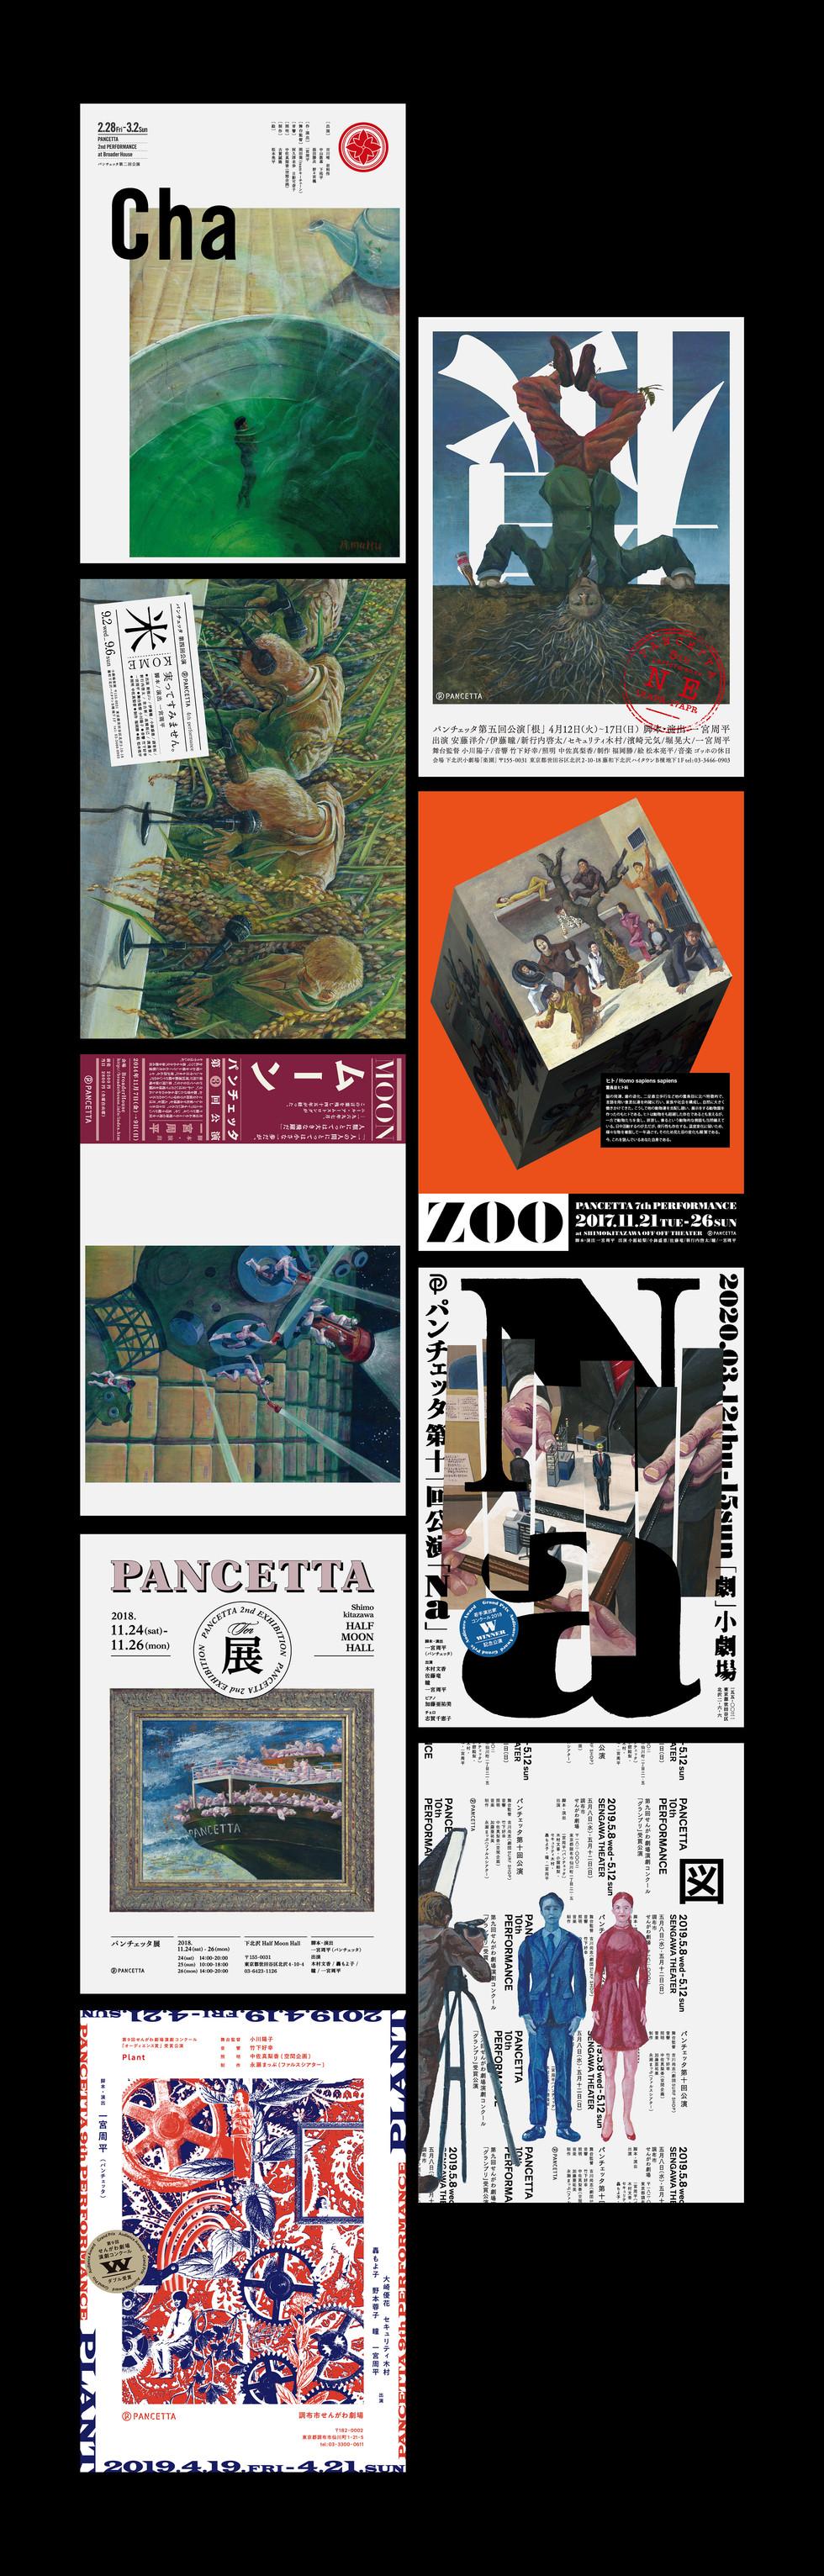 pancetta_vi_07_アートボード 1 のコピー 7.jpg